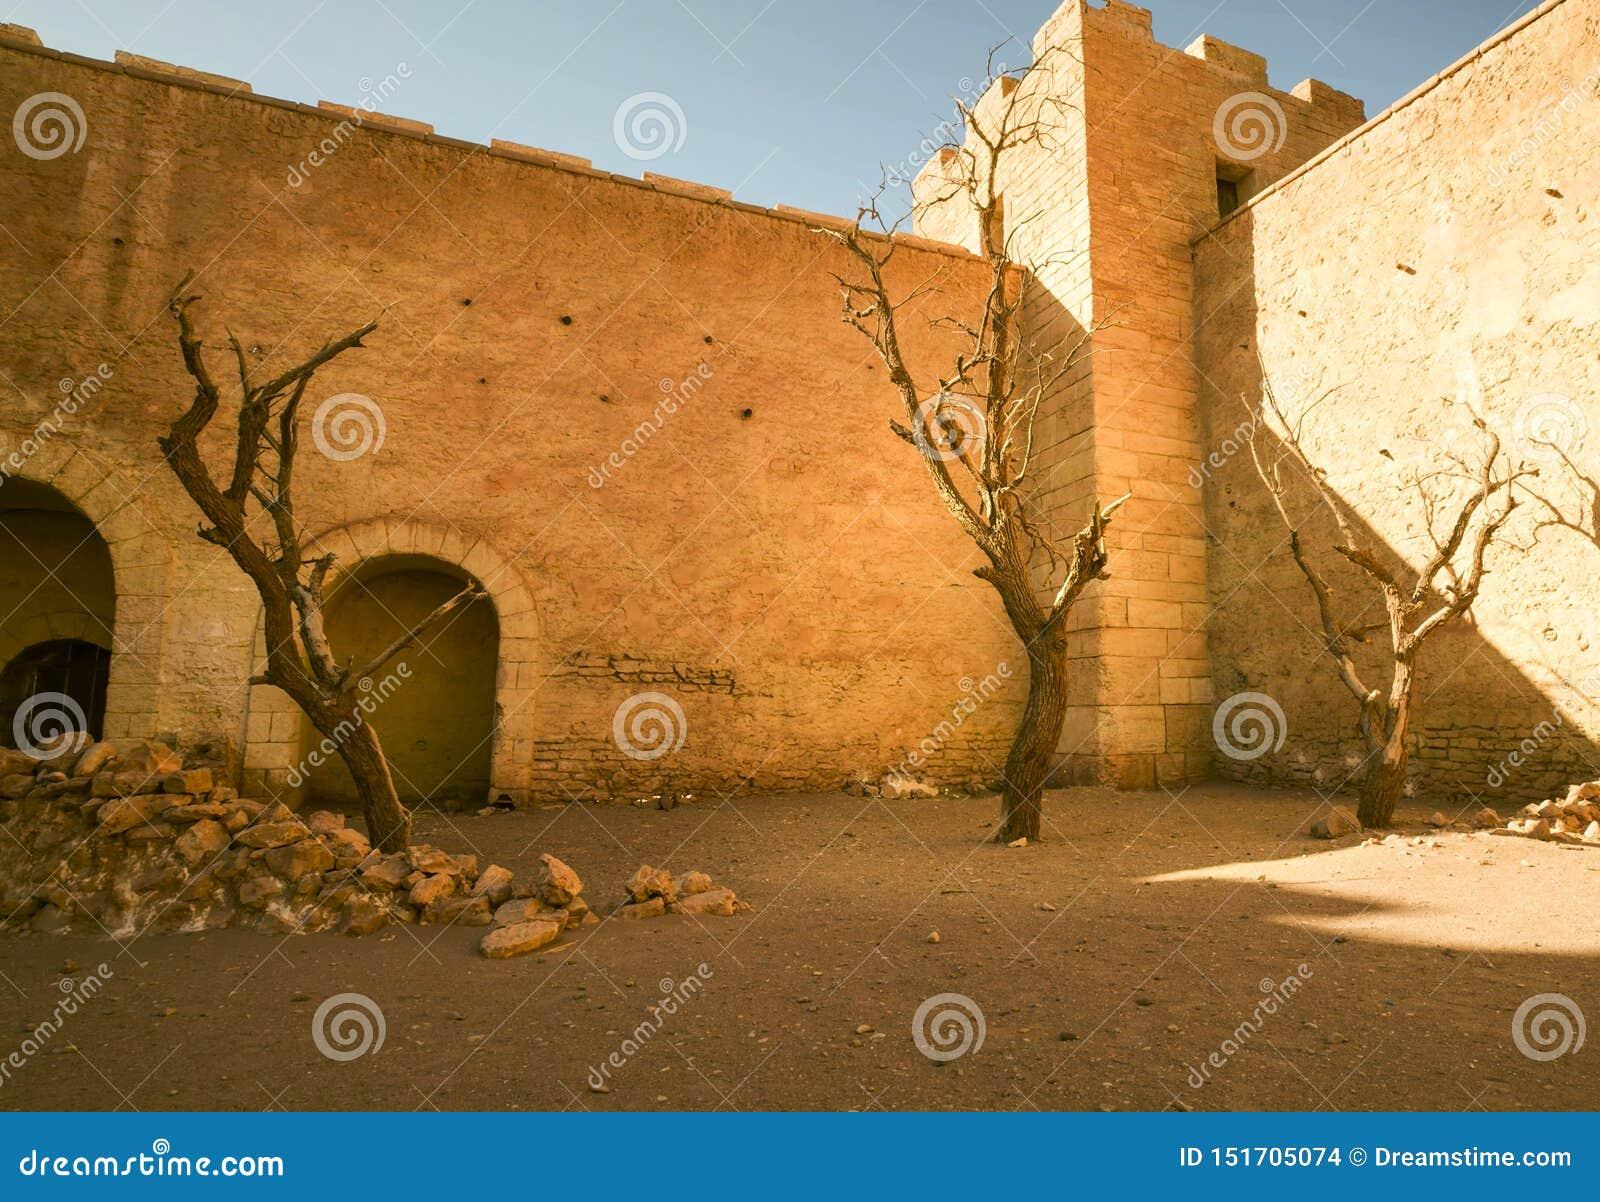 Konungariket Marocko lokaliseras i Nordafrika Marocko — ett land av frestelsen,